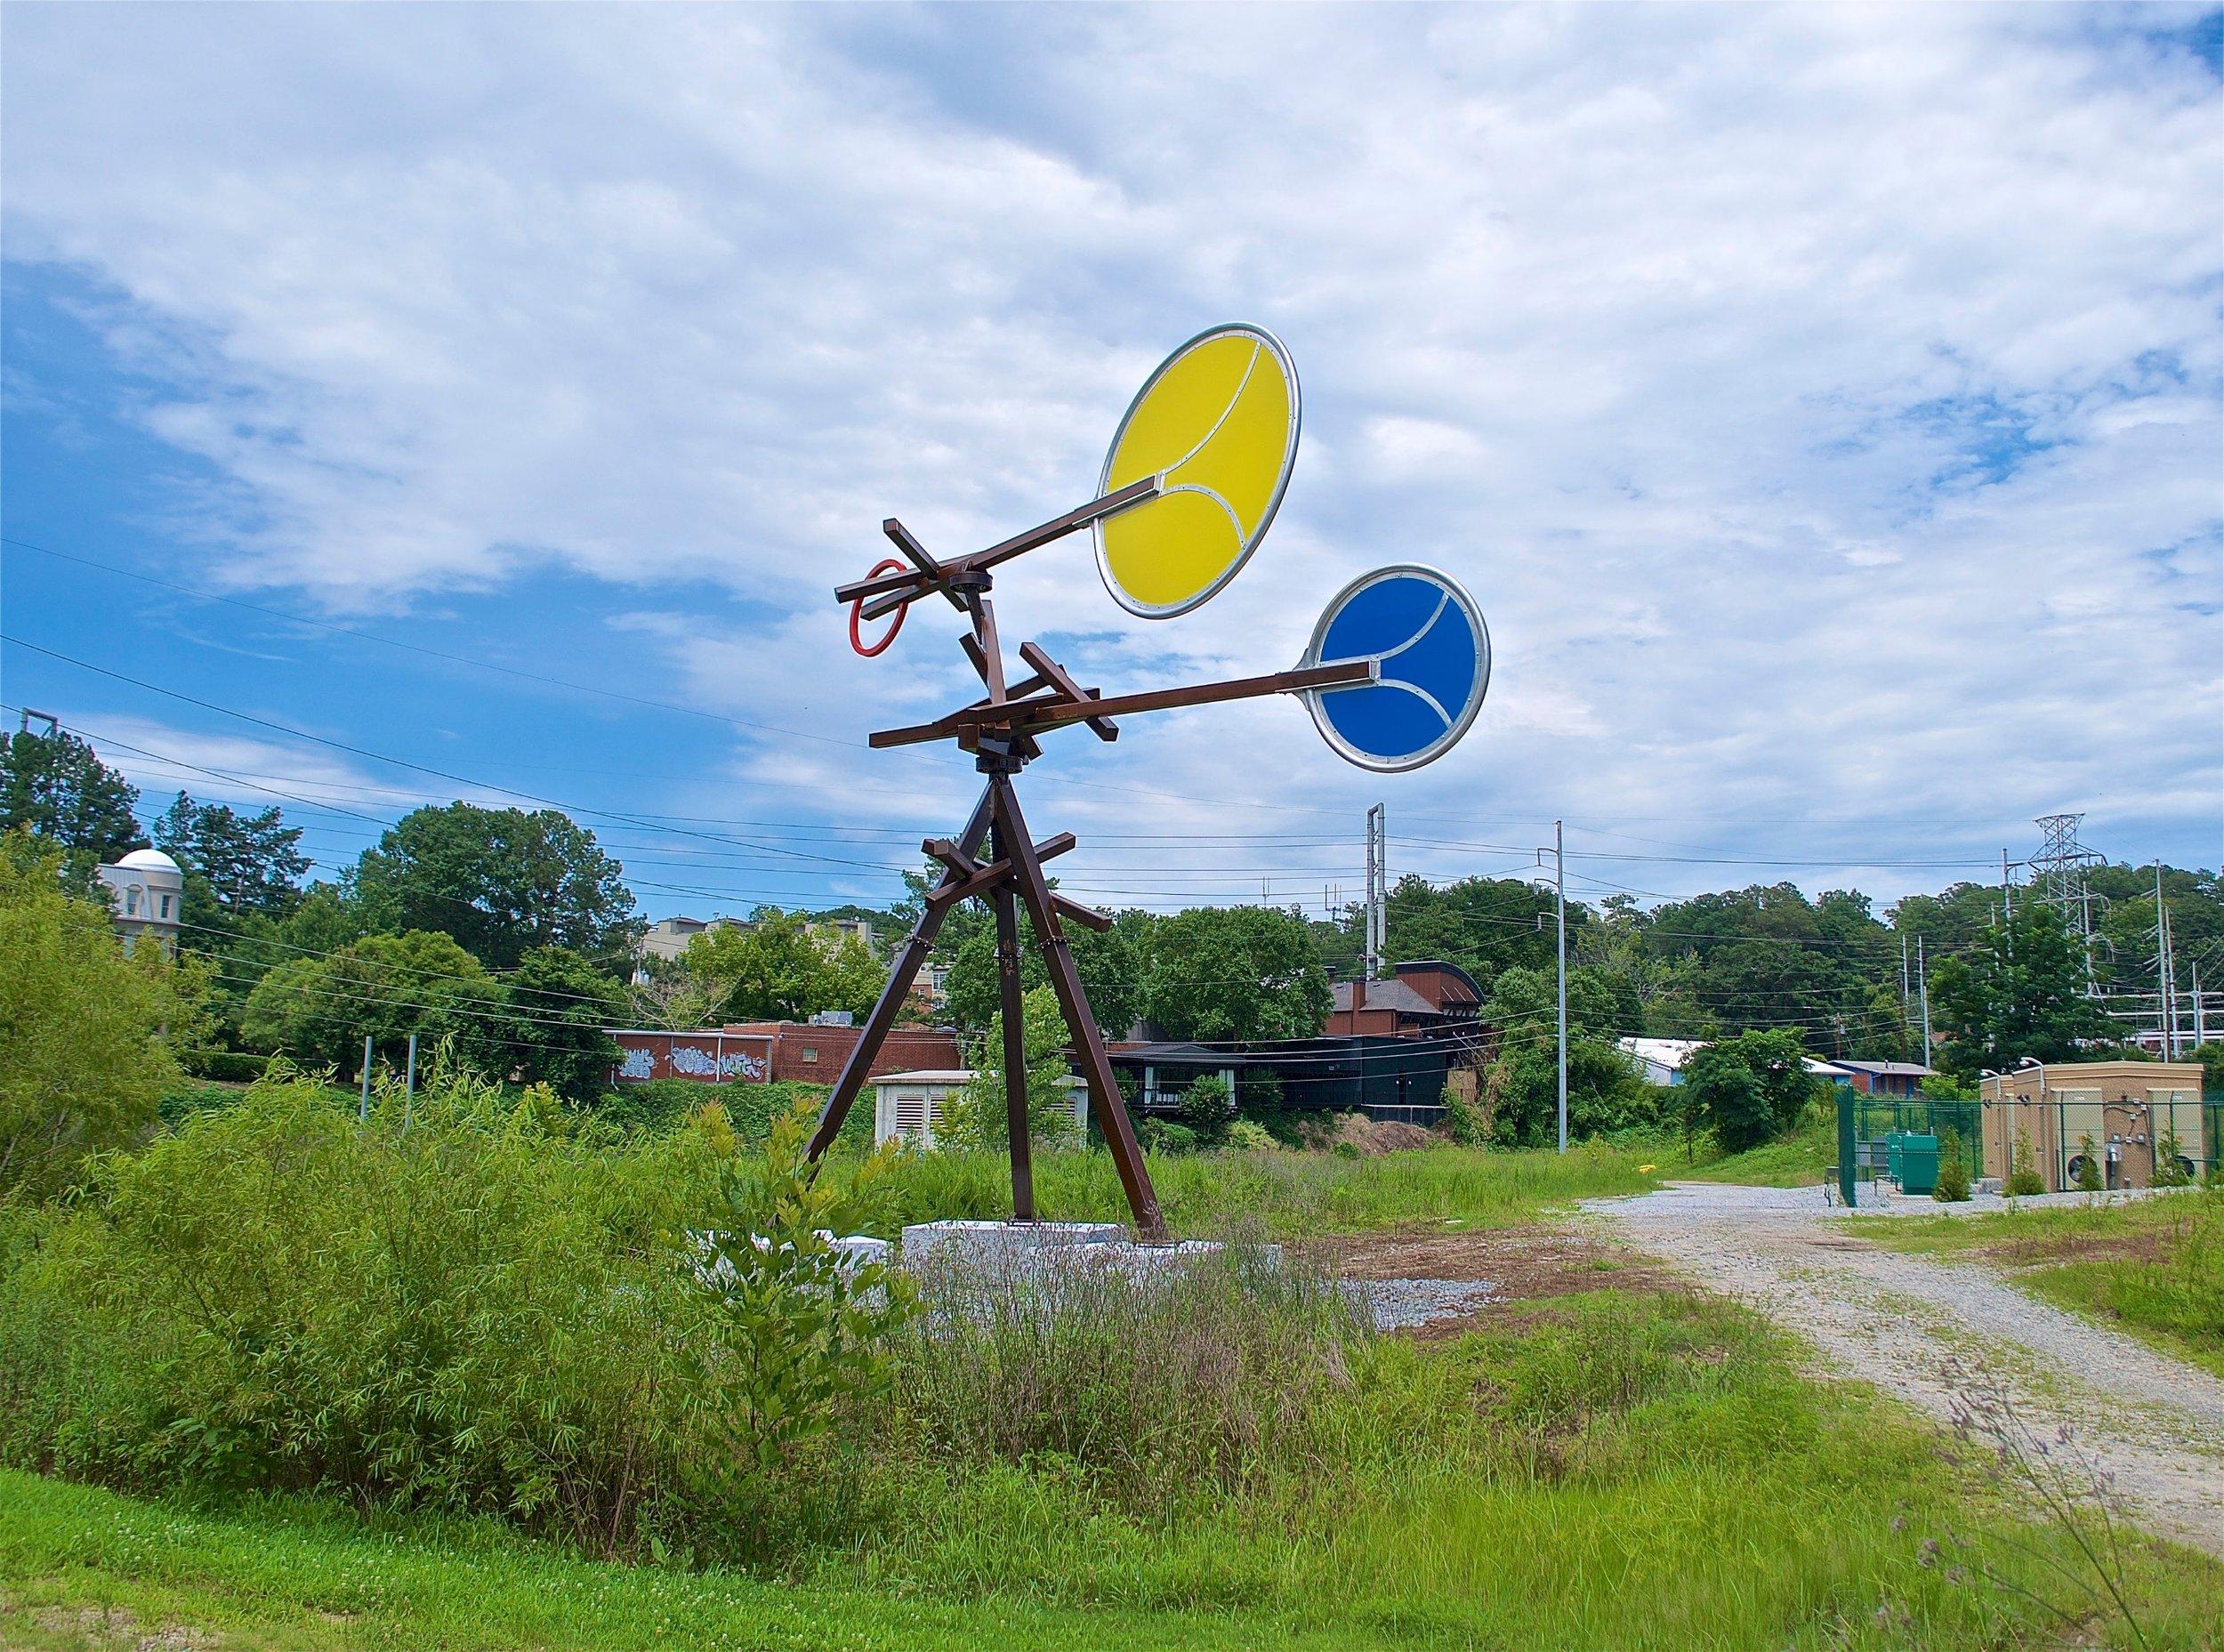 Solar Wind | 2017 | Art on the Atlanta Beltline (Continuing exhibition)